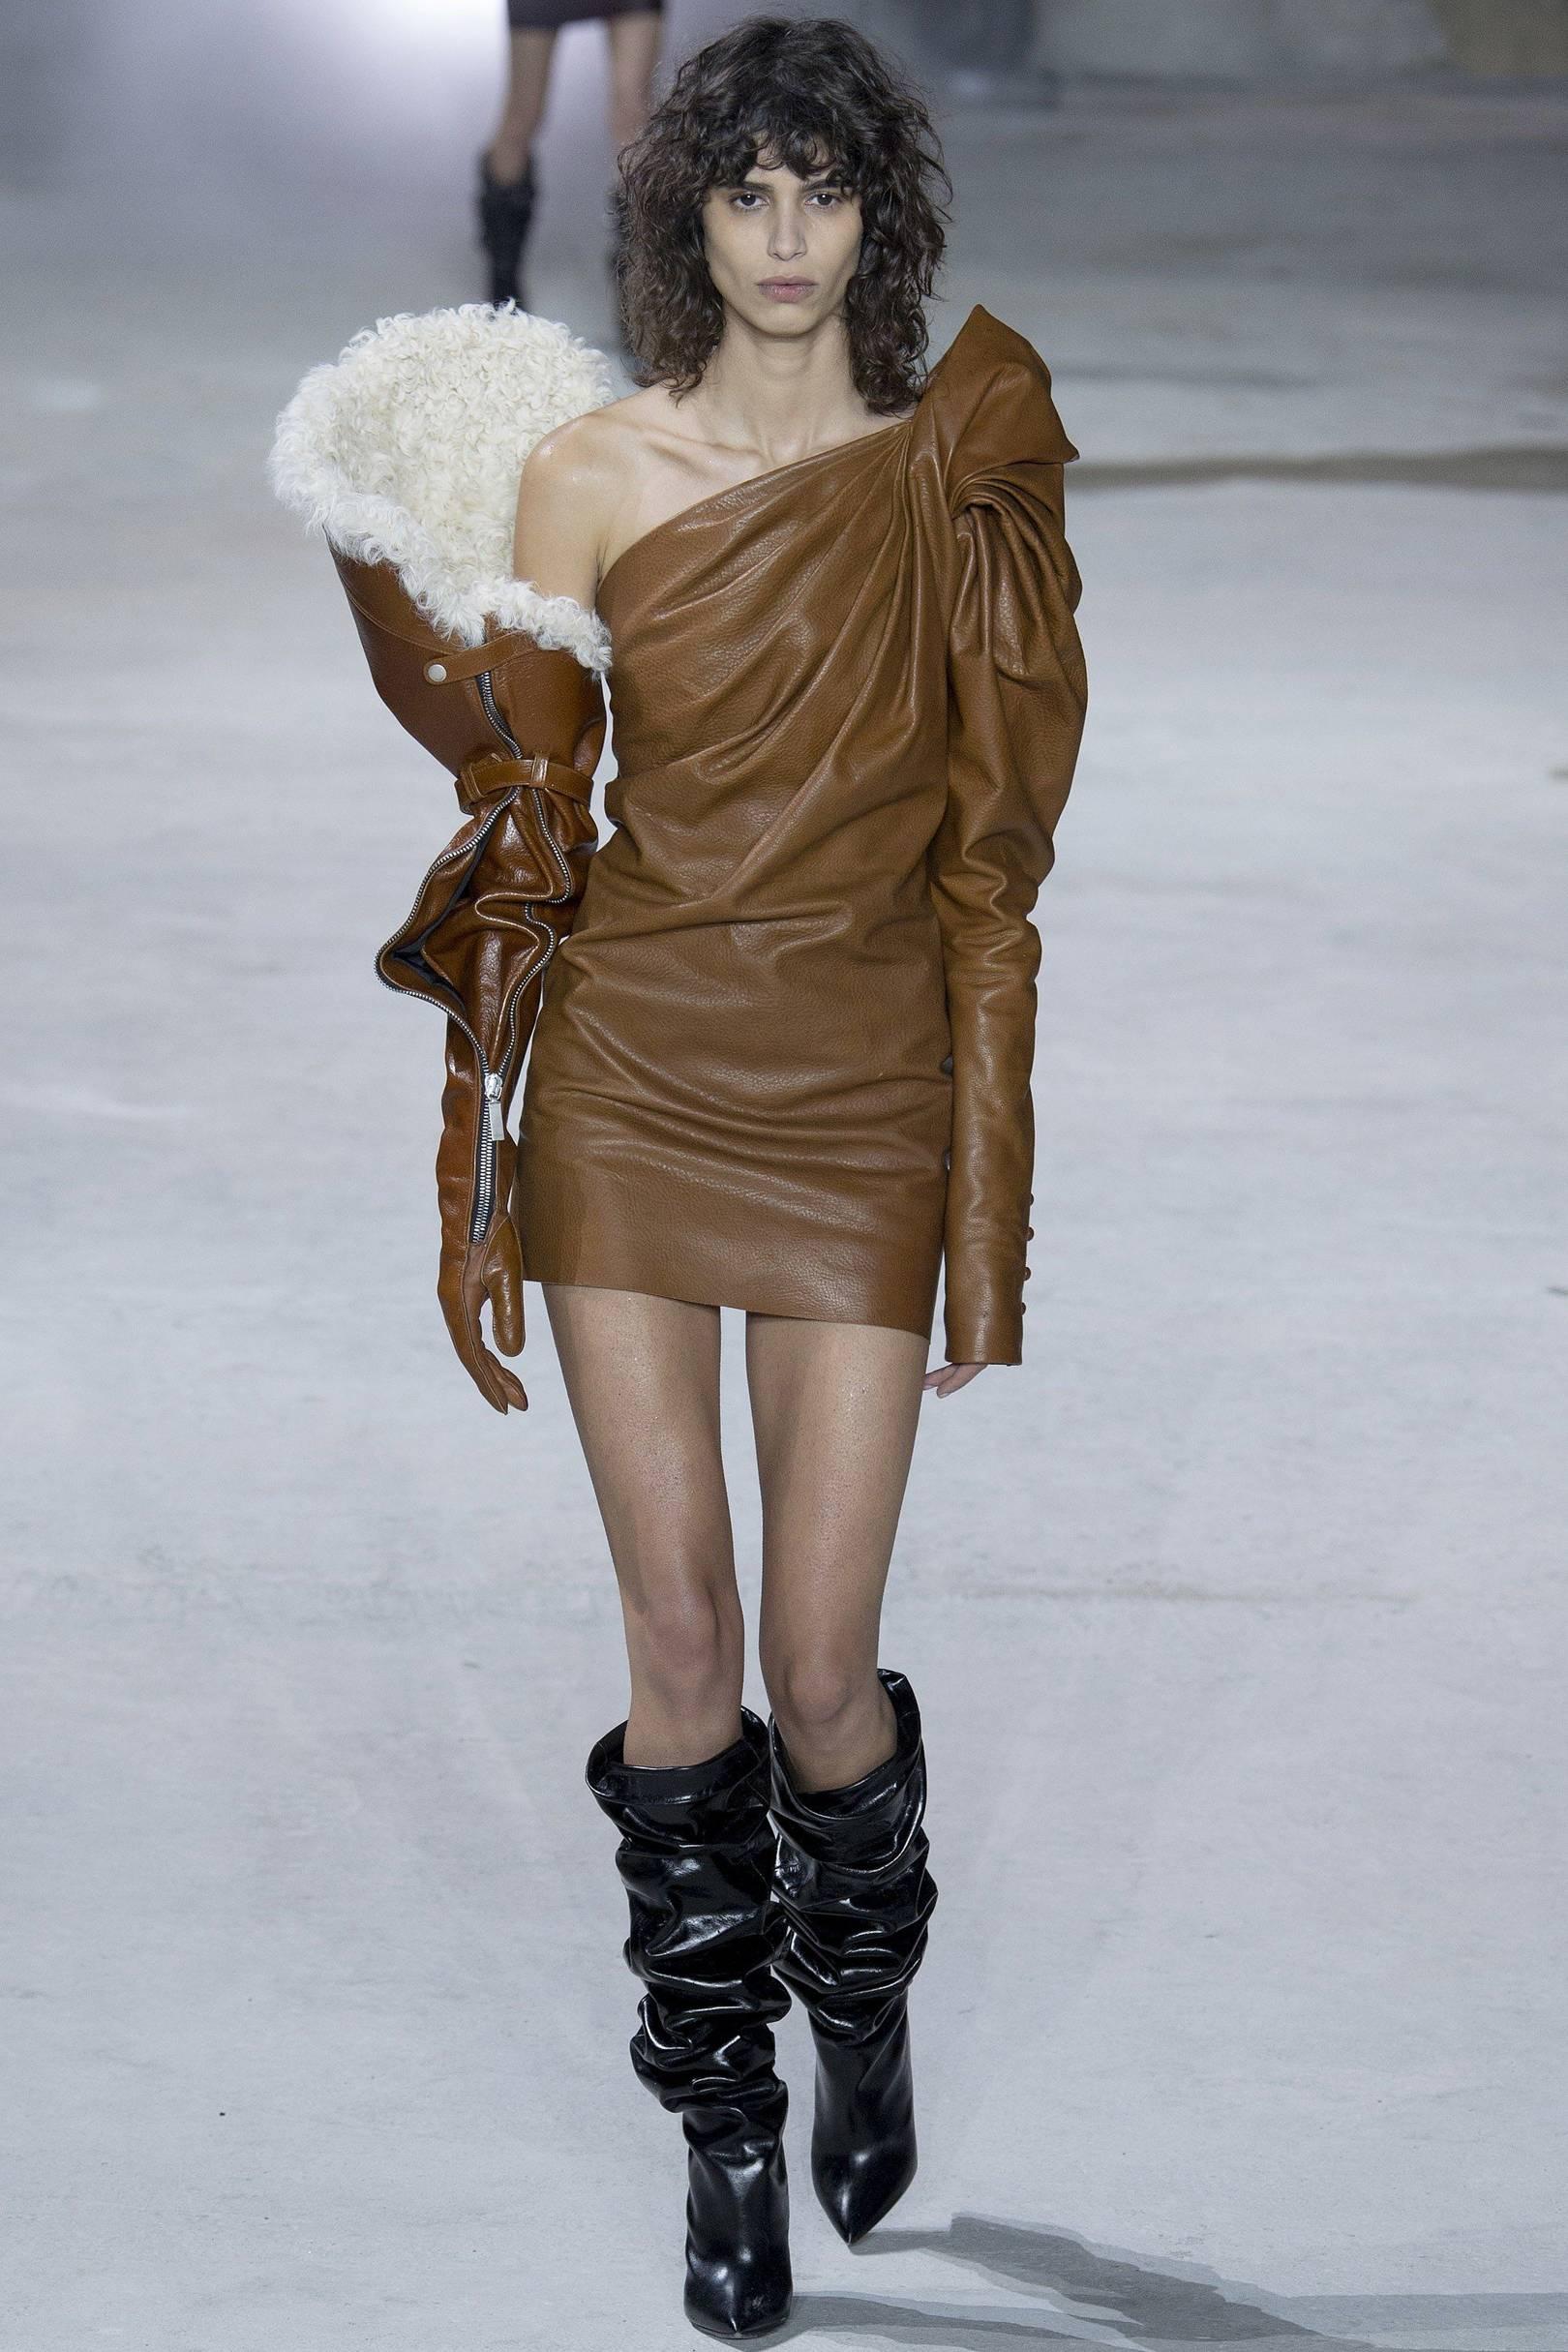 460845b16b3 Suzy Menkes reviews Anthony Vaccarello's Saint Laurent show | British Vogue